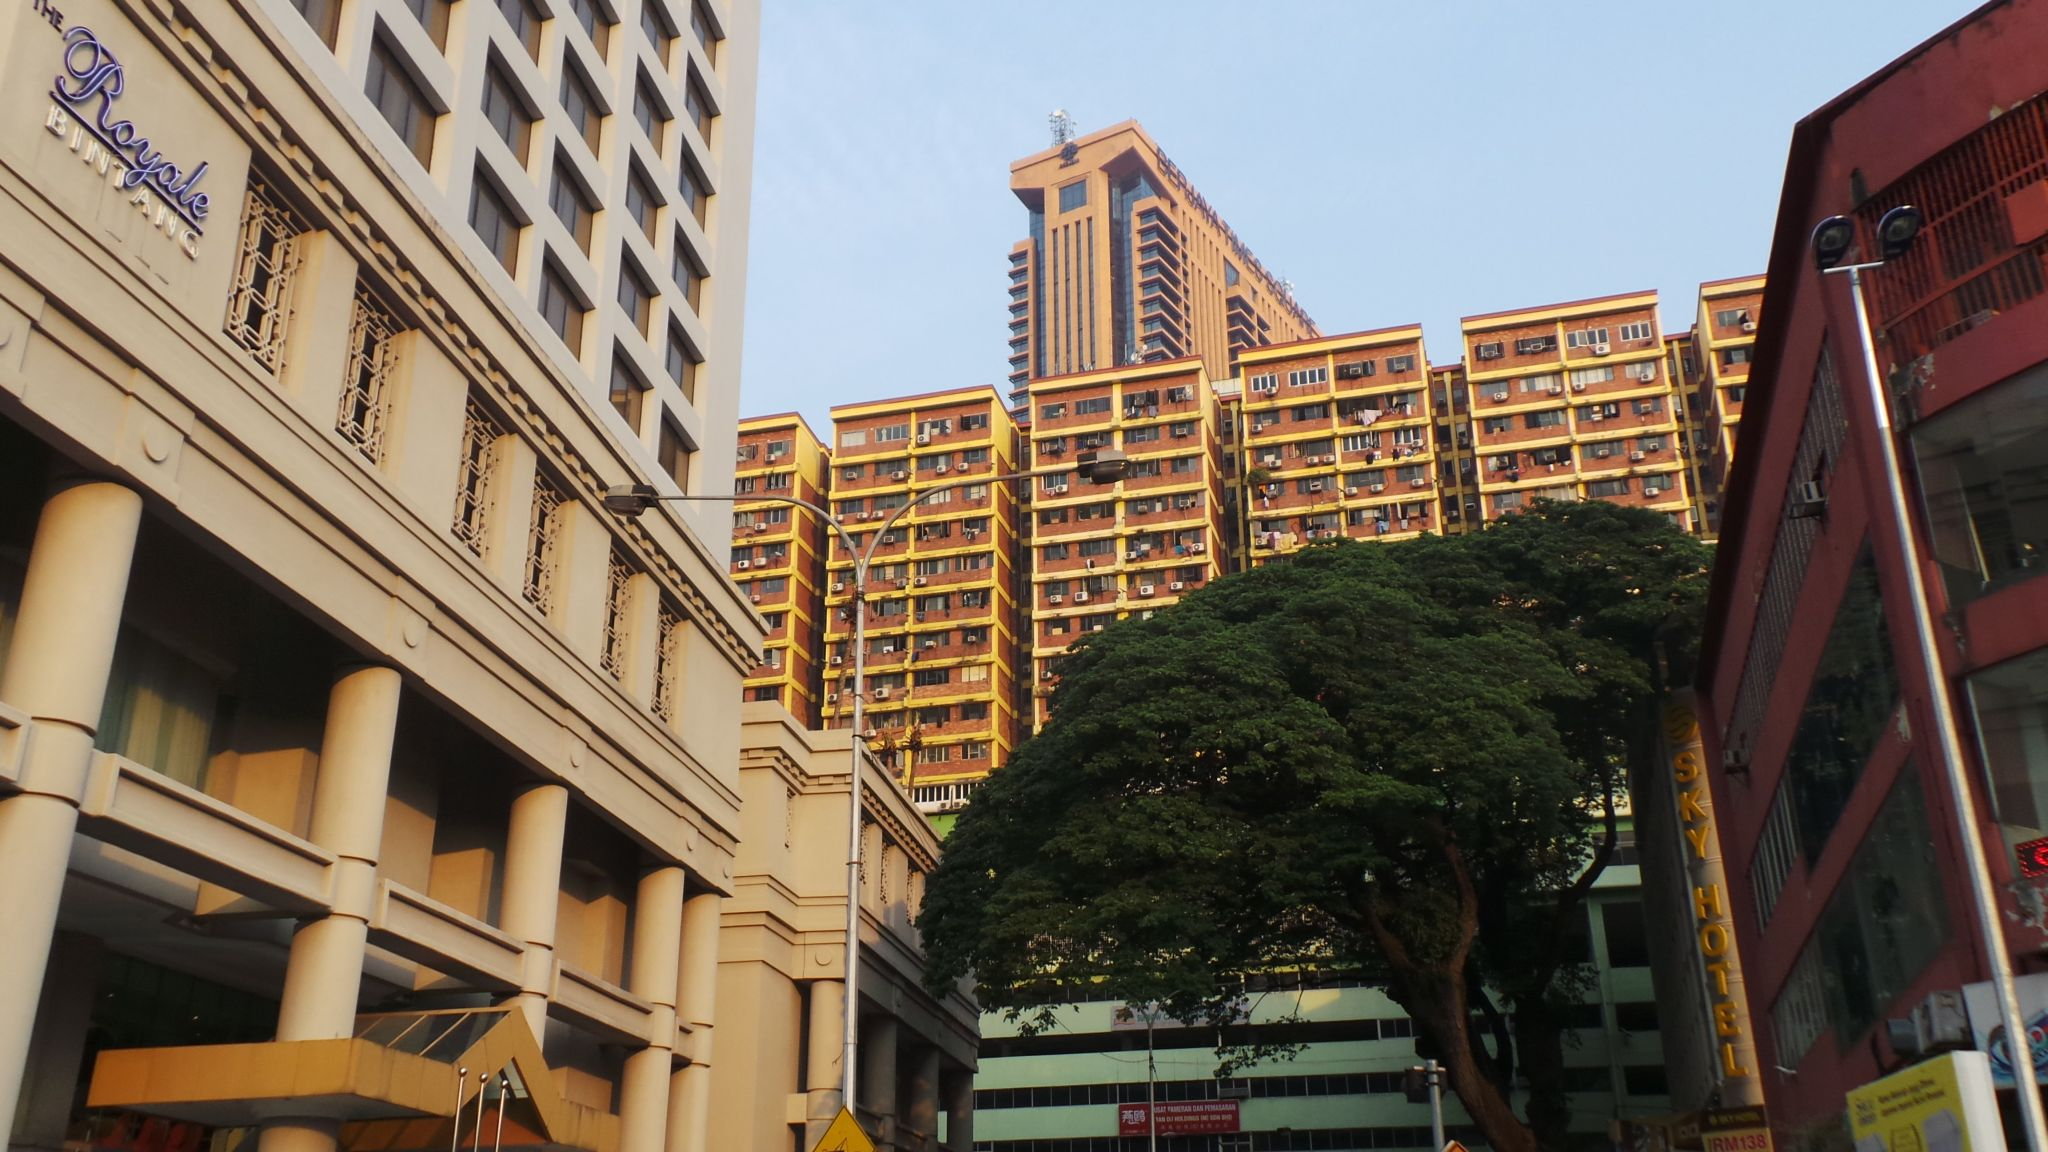 Malaisie… 1ères impressions